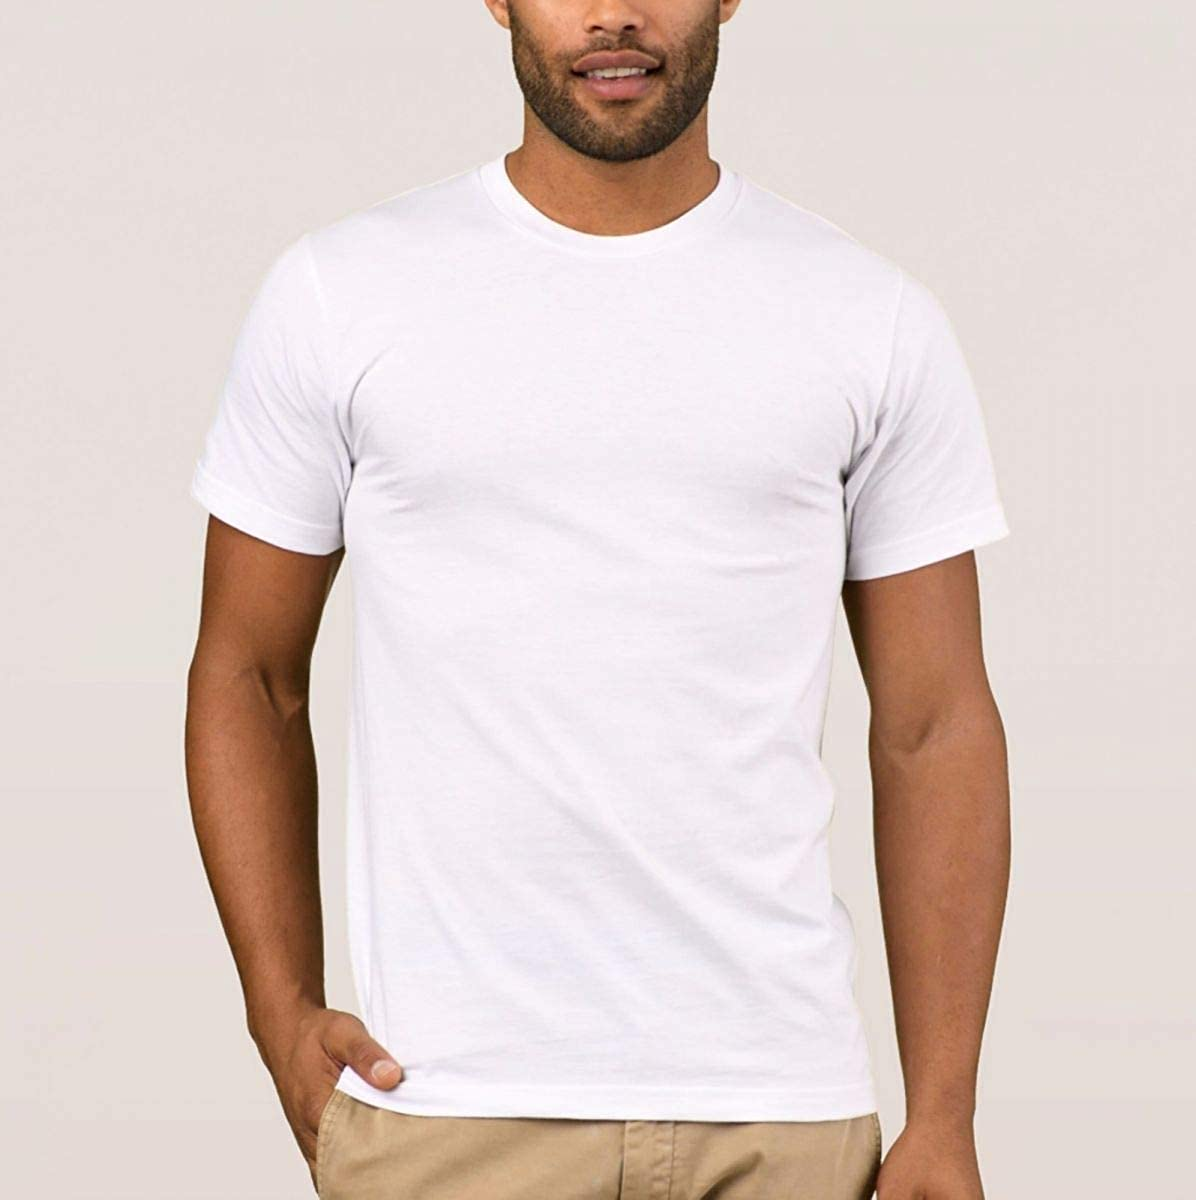 Mens Budweiser Classic Short Sleeve T-Shirts Top Tees